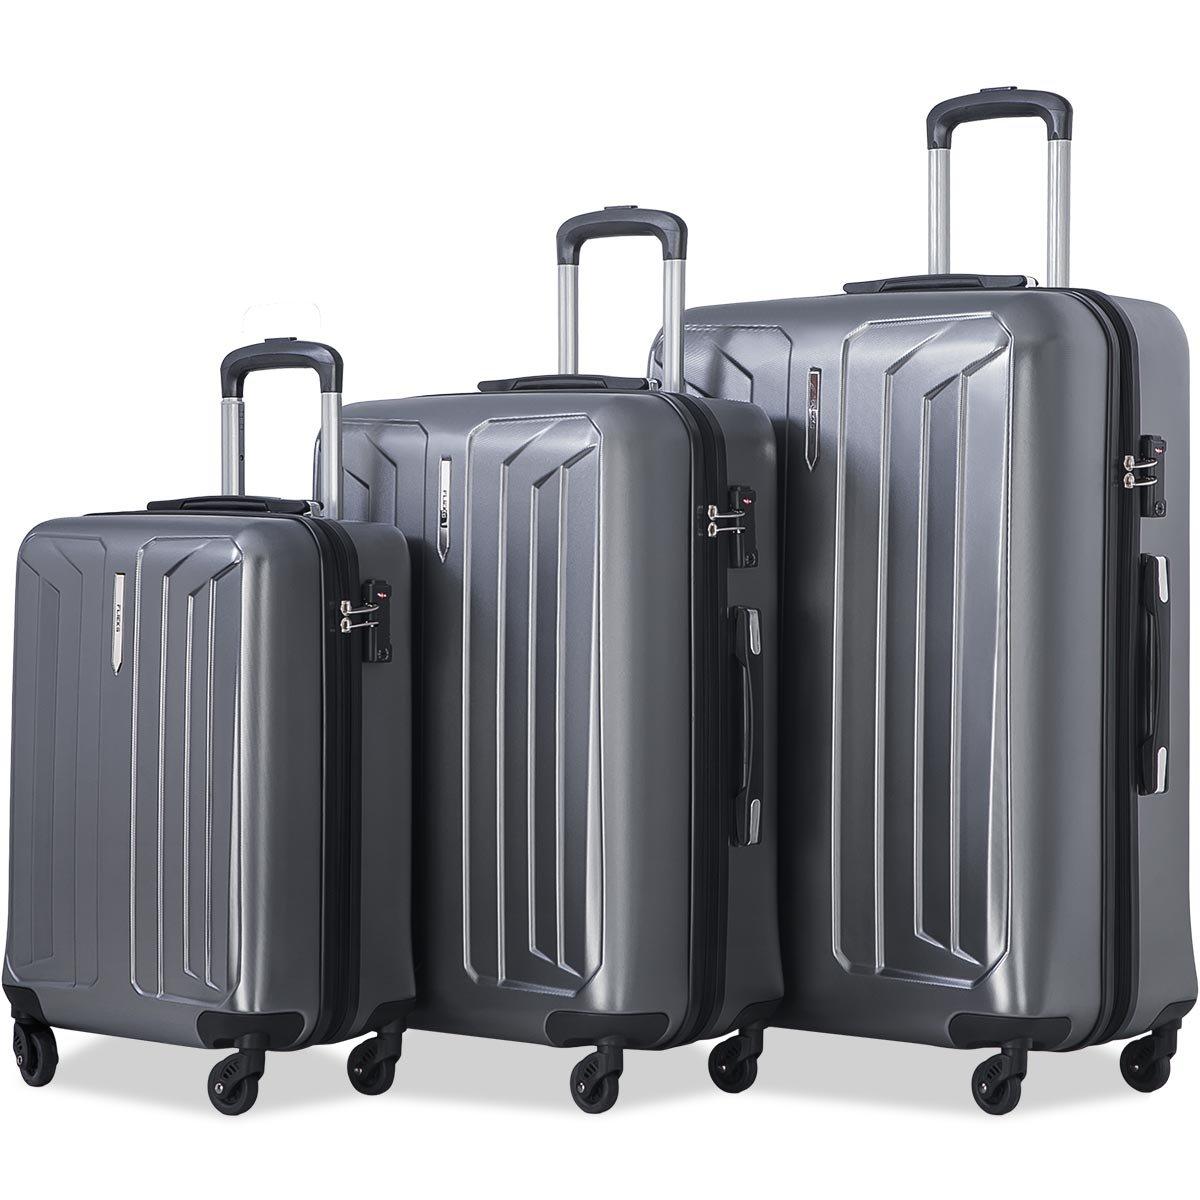 Flieks Luggage 3 Piece Sets Spinner Suitcase with TSA Lock, Lightweight 20 24 28 in (Grey)